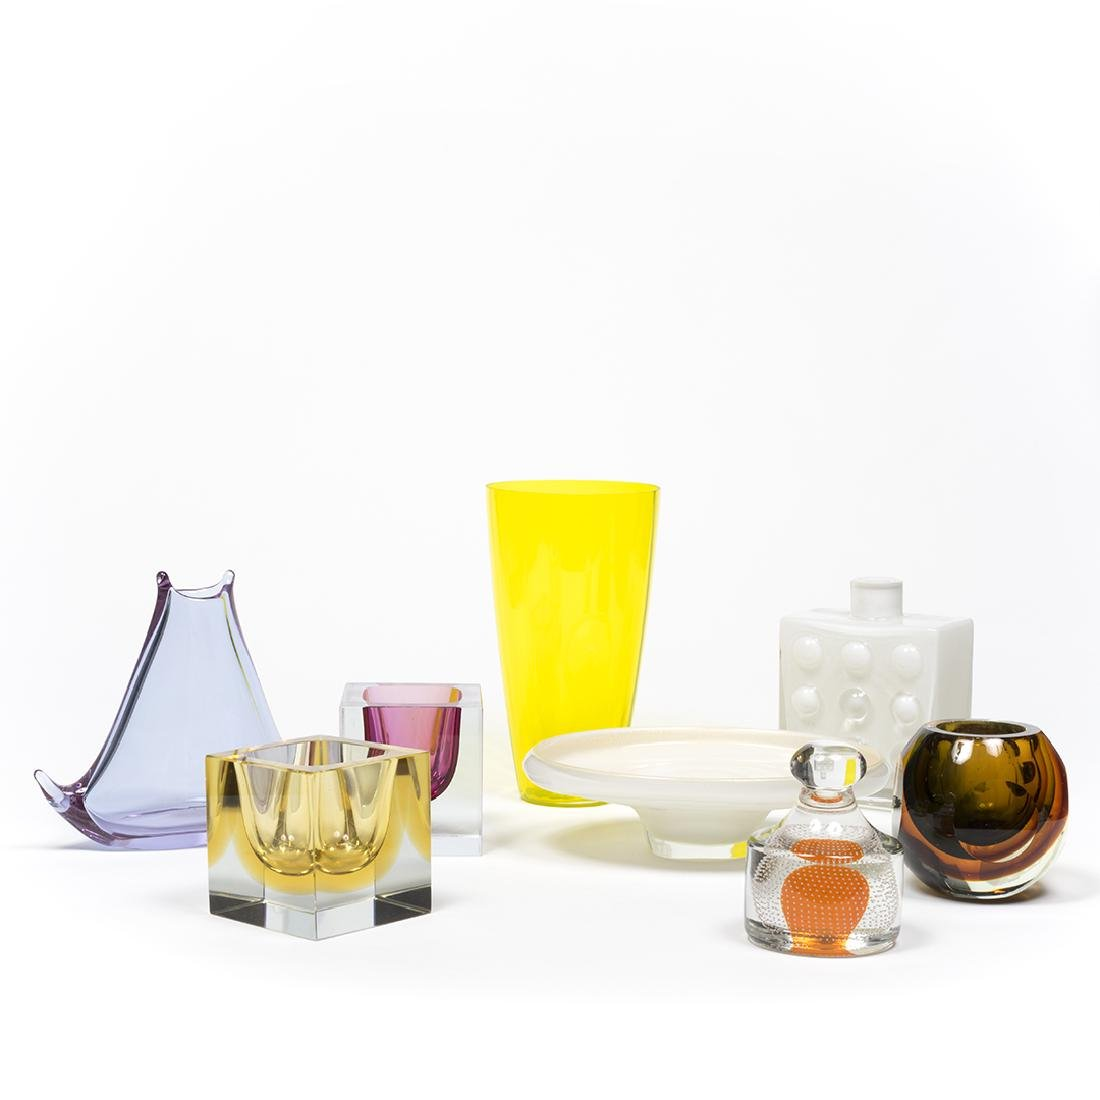 Murano Glass Objects (8)